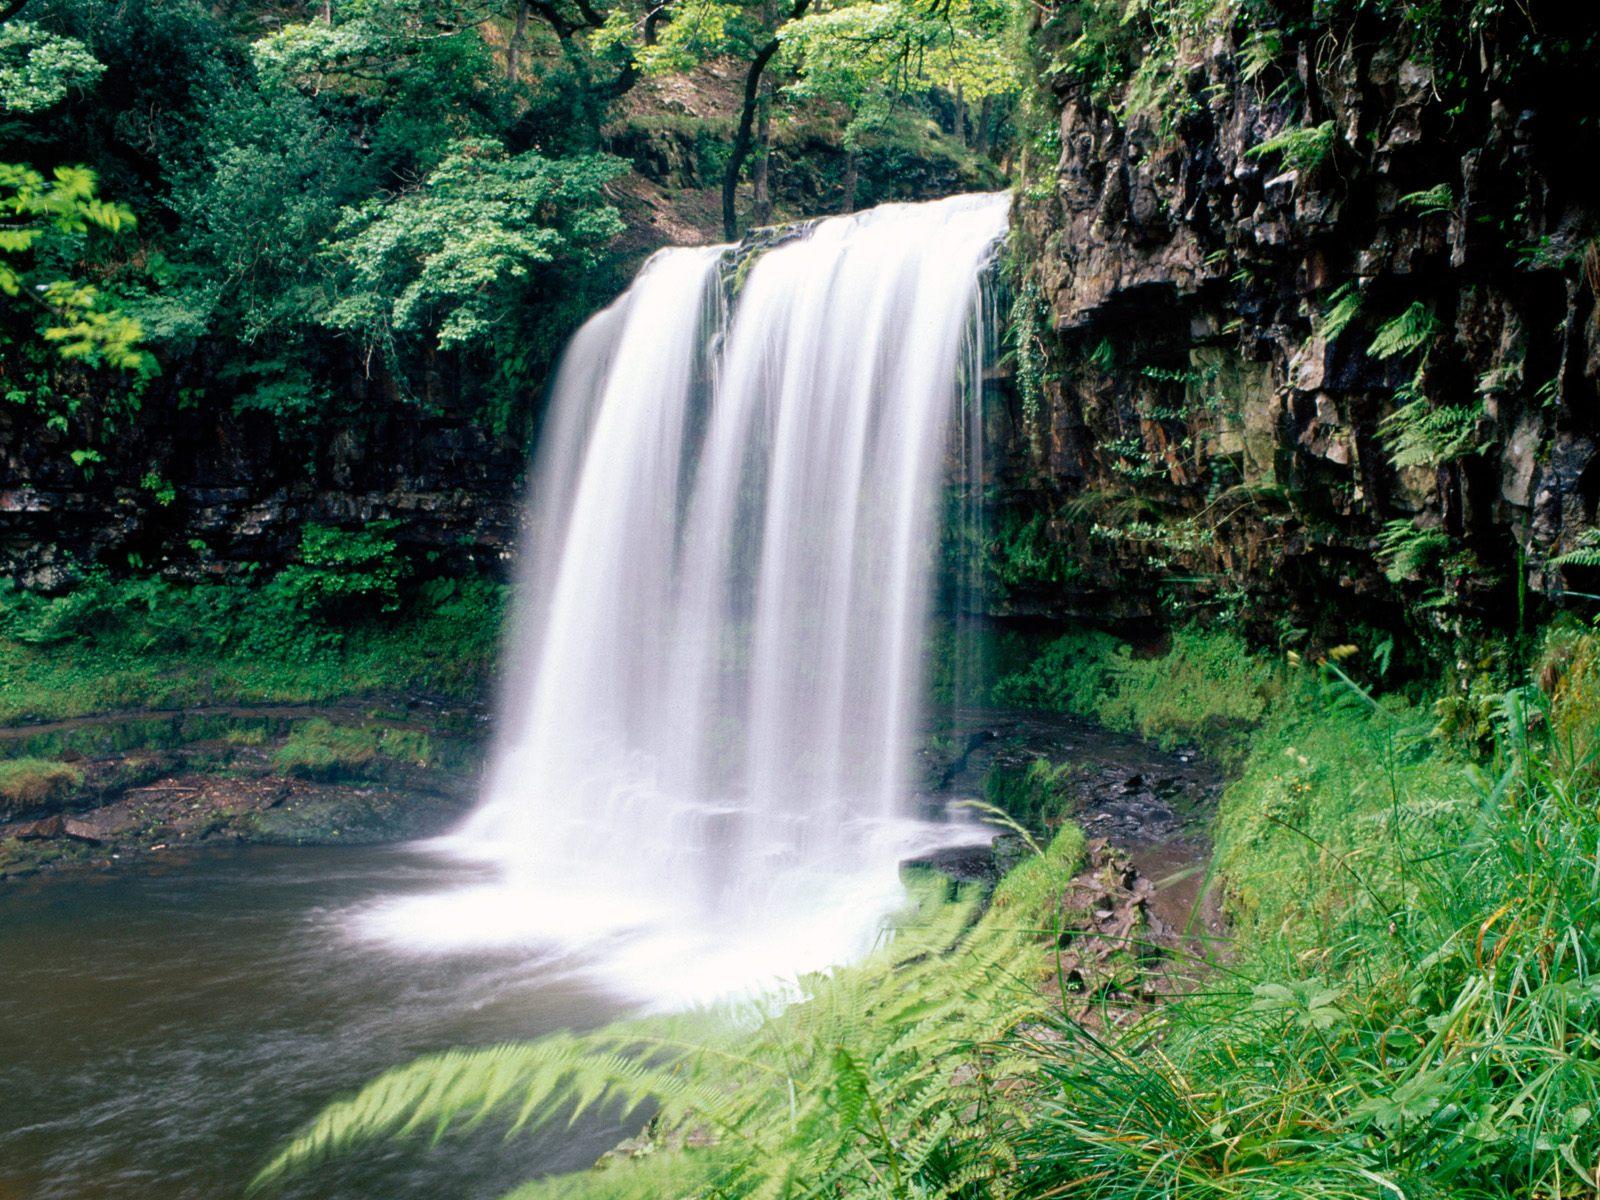 Wallpaper pemandangan air terjun brecon beacons national park south